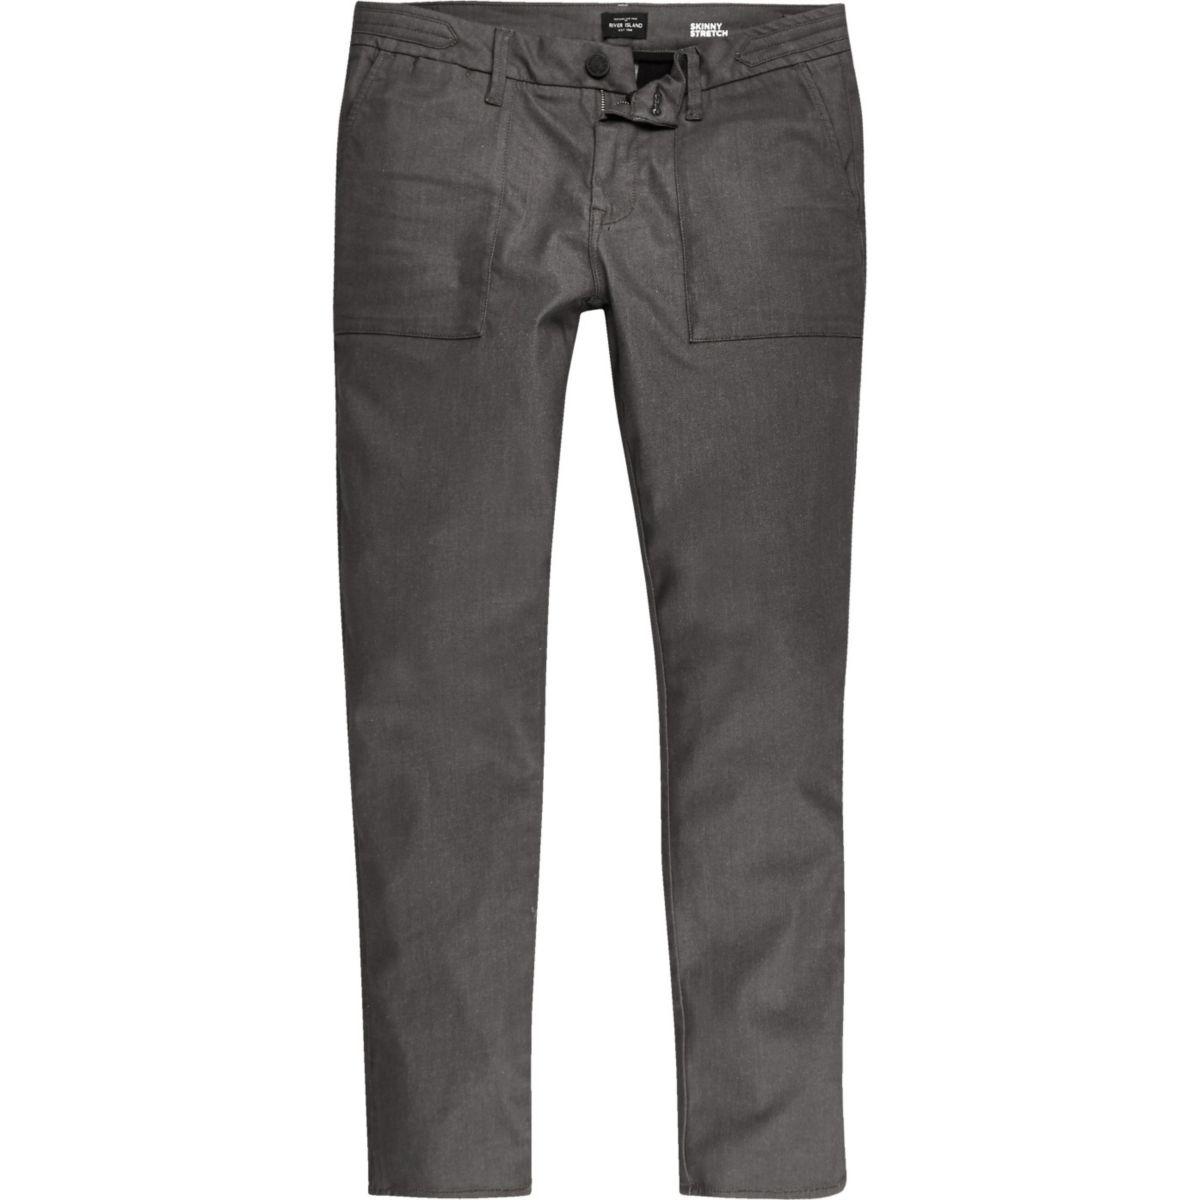 Brown Sid skinny stretch jeans